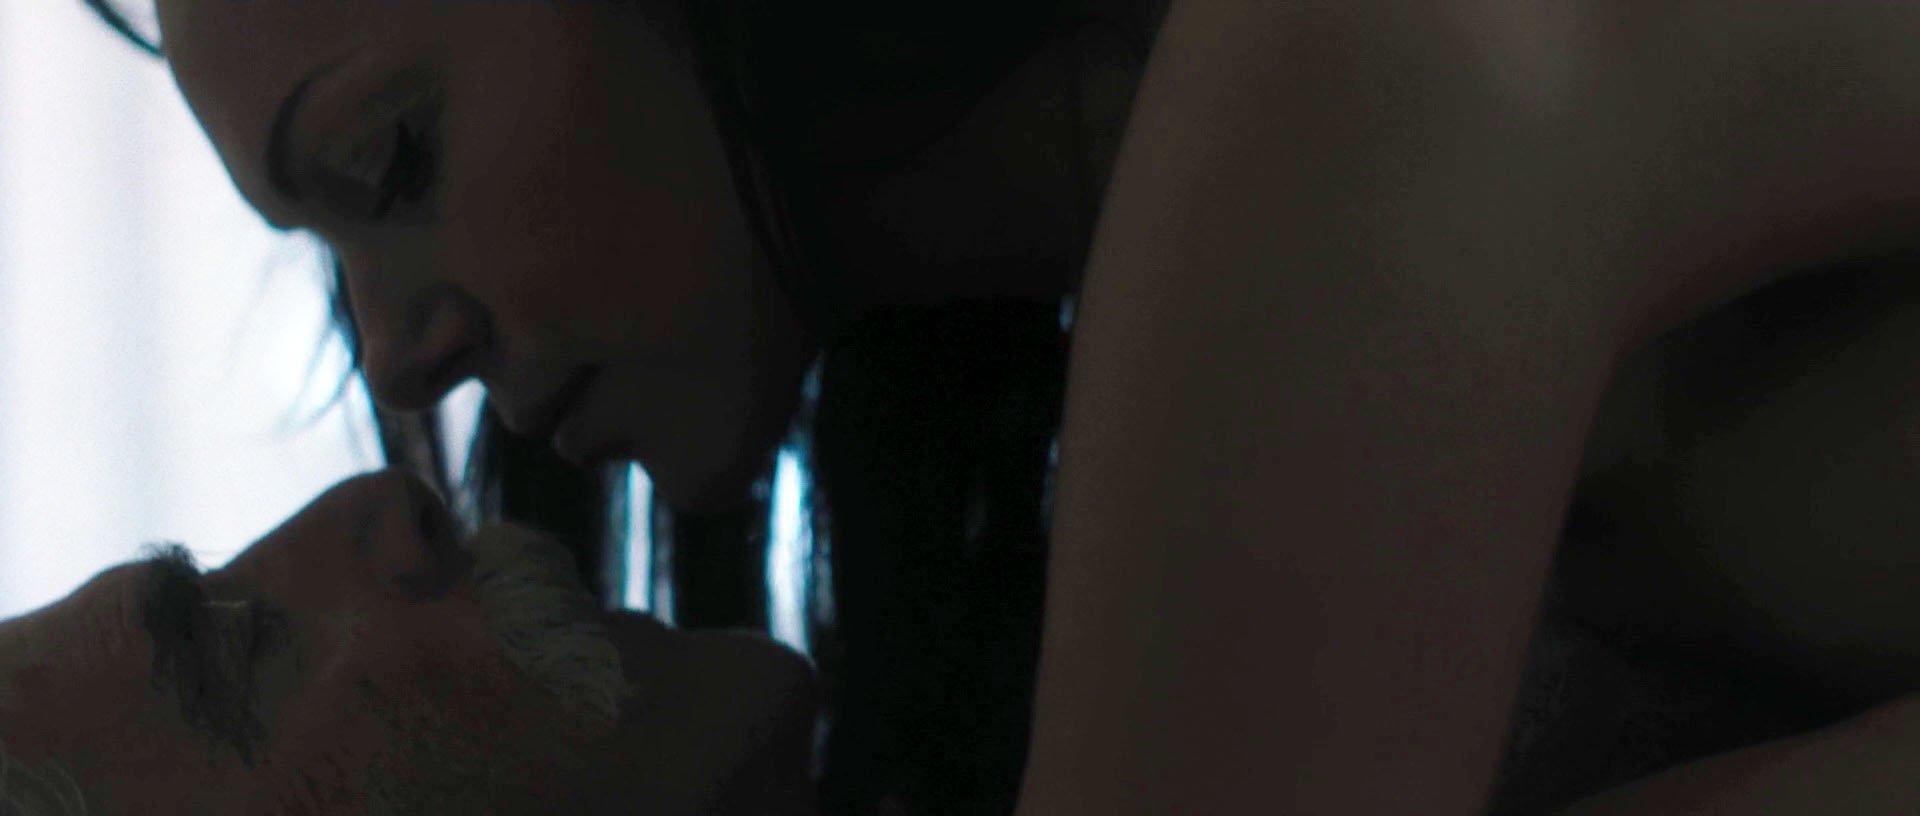 Xhamster black lasbians anal fisting